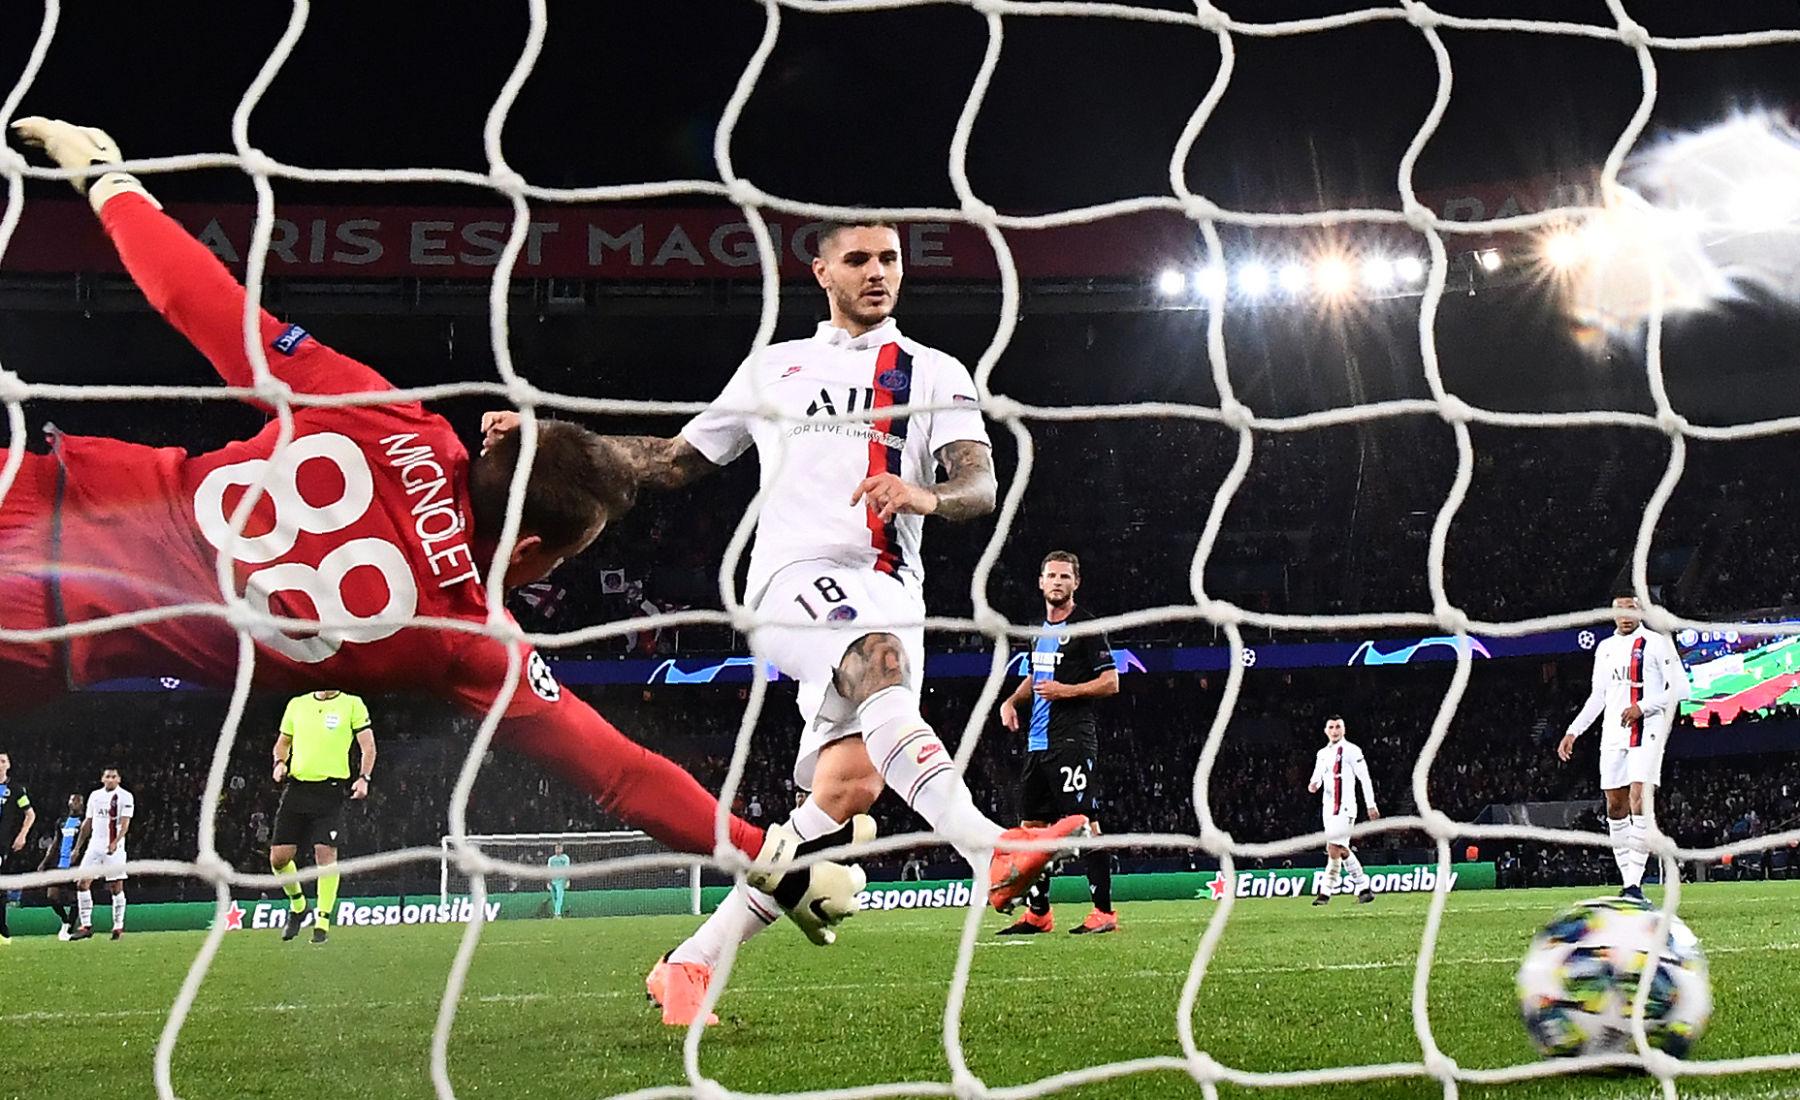 Mauro-Icardi-Goalscorer-PSG-vs-Club-Brugge-Champions-League-2019